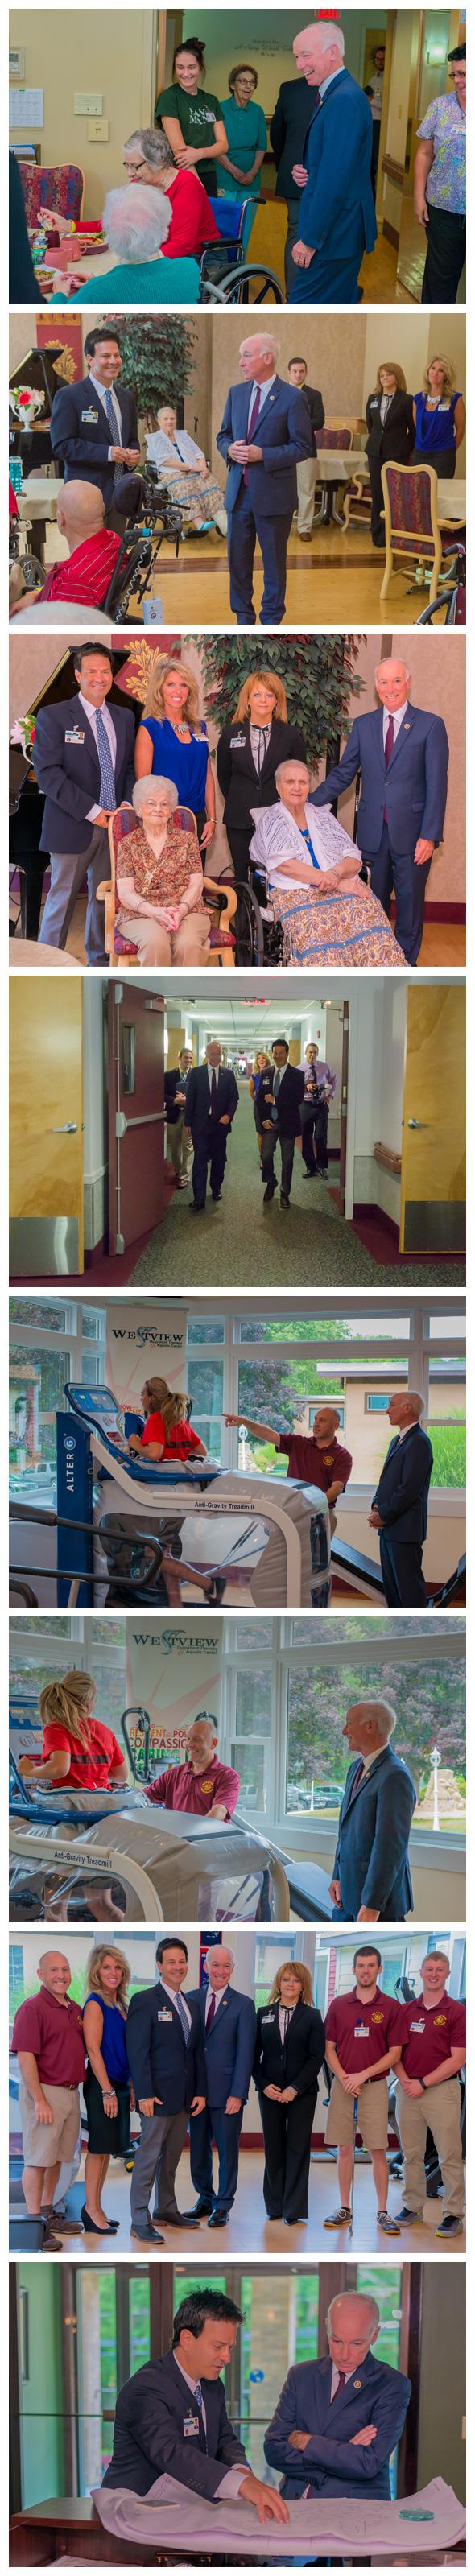 Photo montage of Congressman Joe Courtney's visit to Westview